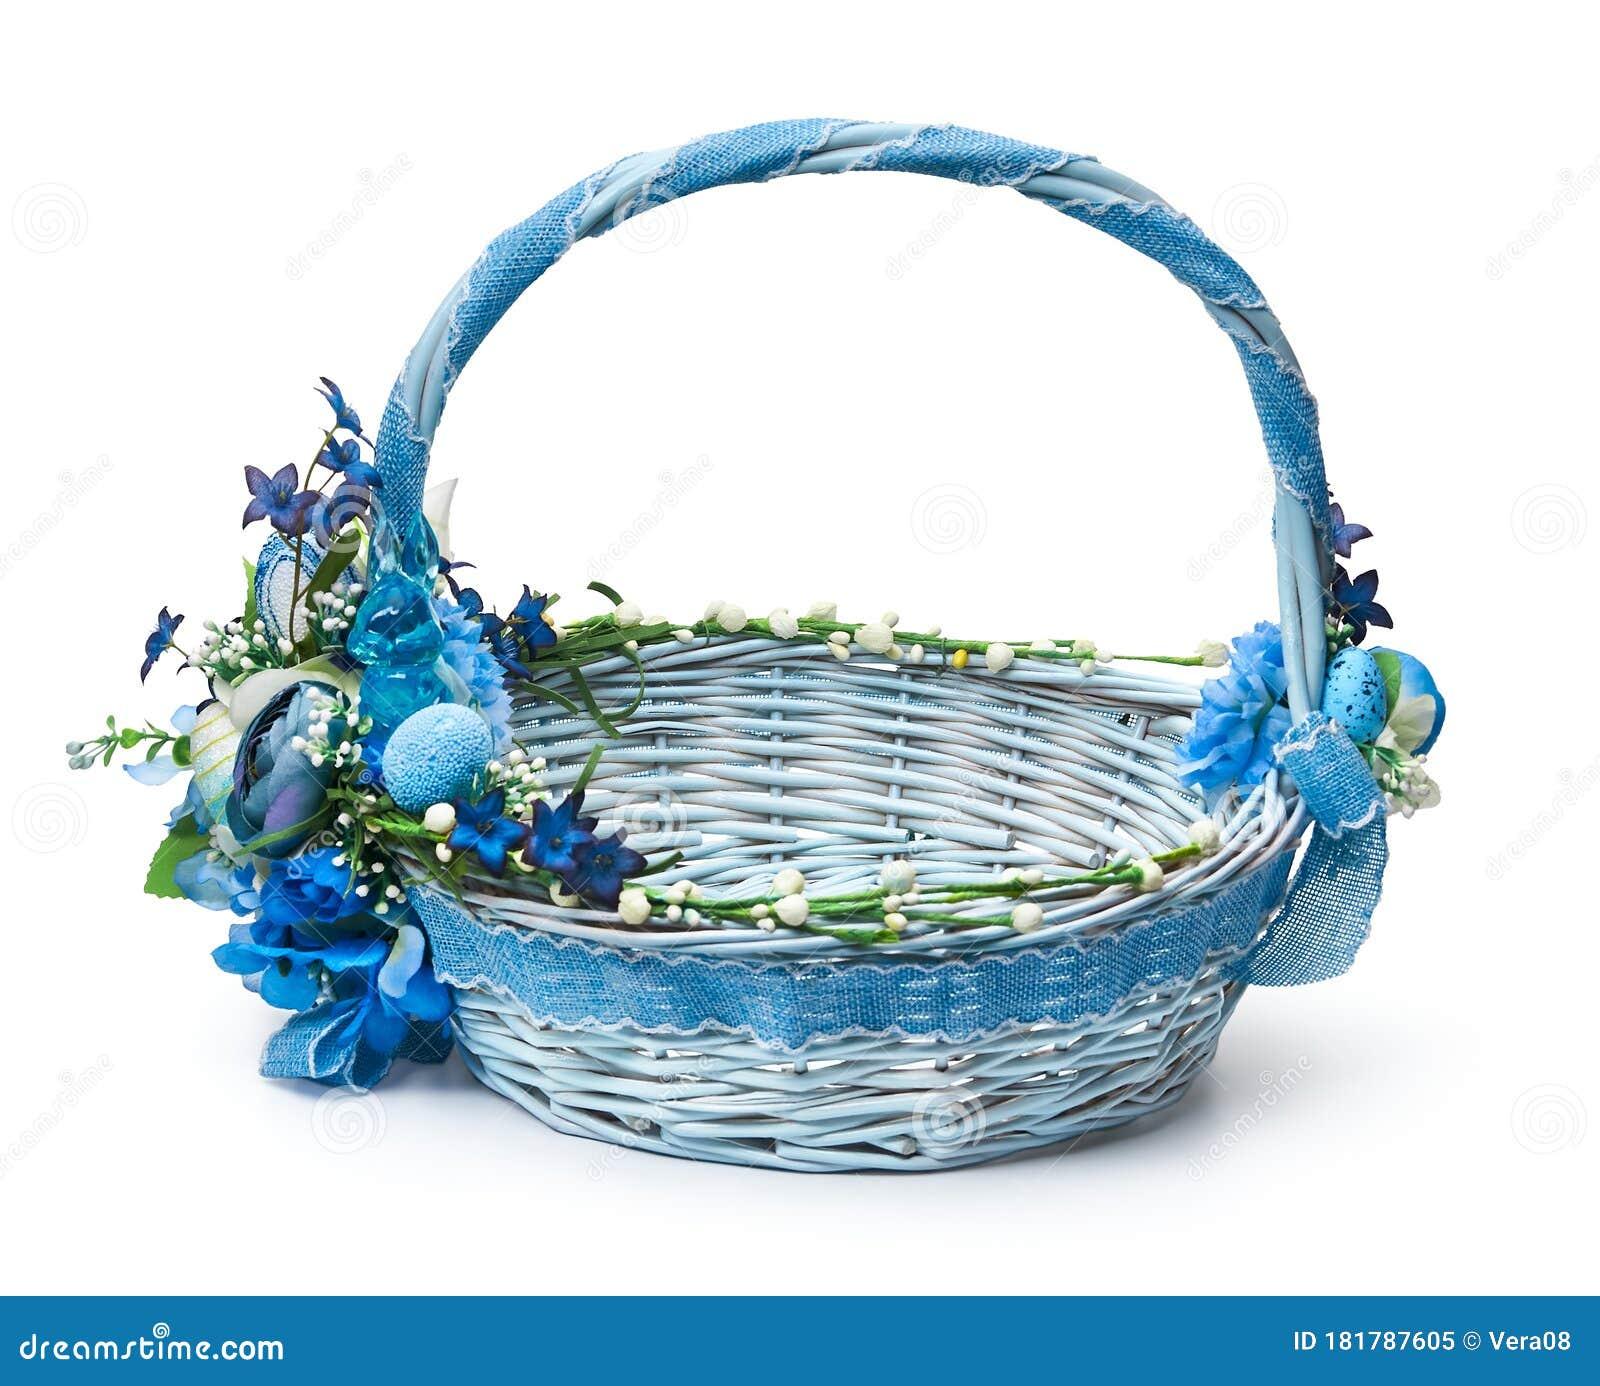 Festive Basket With A Flower Arrangement Stock Image Image Of Weaving Concept 181787605